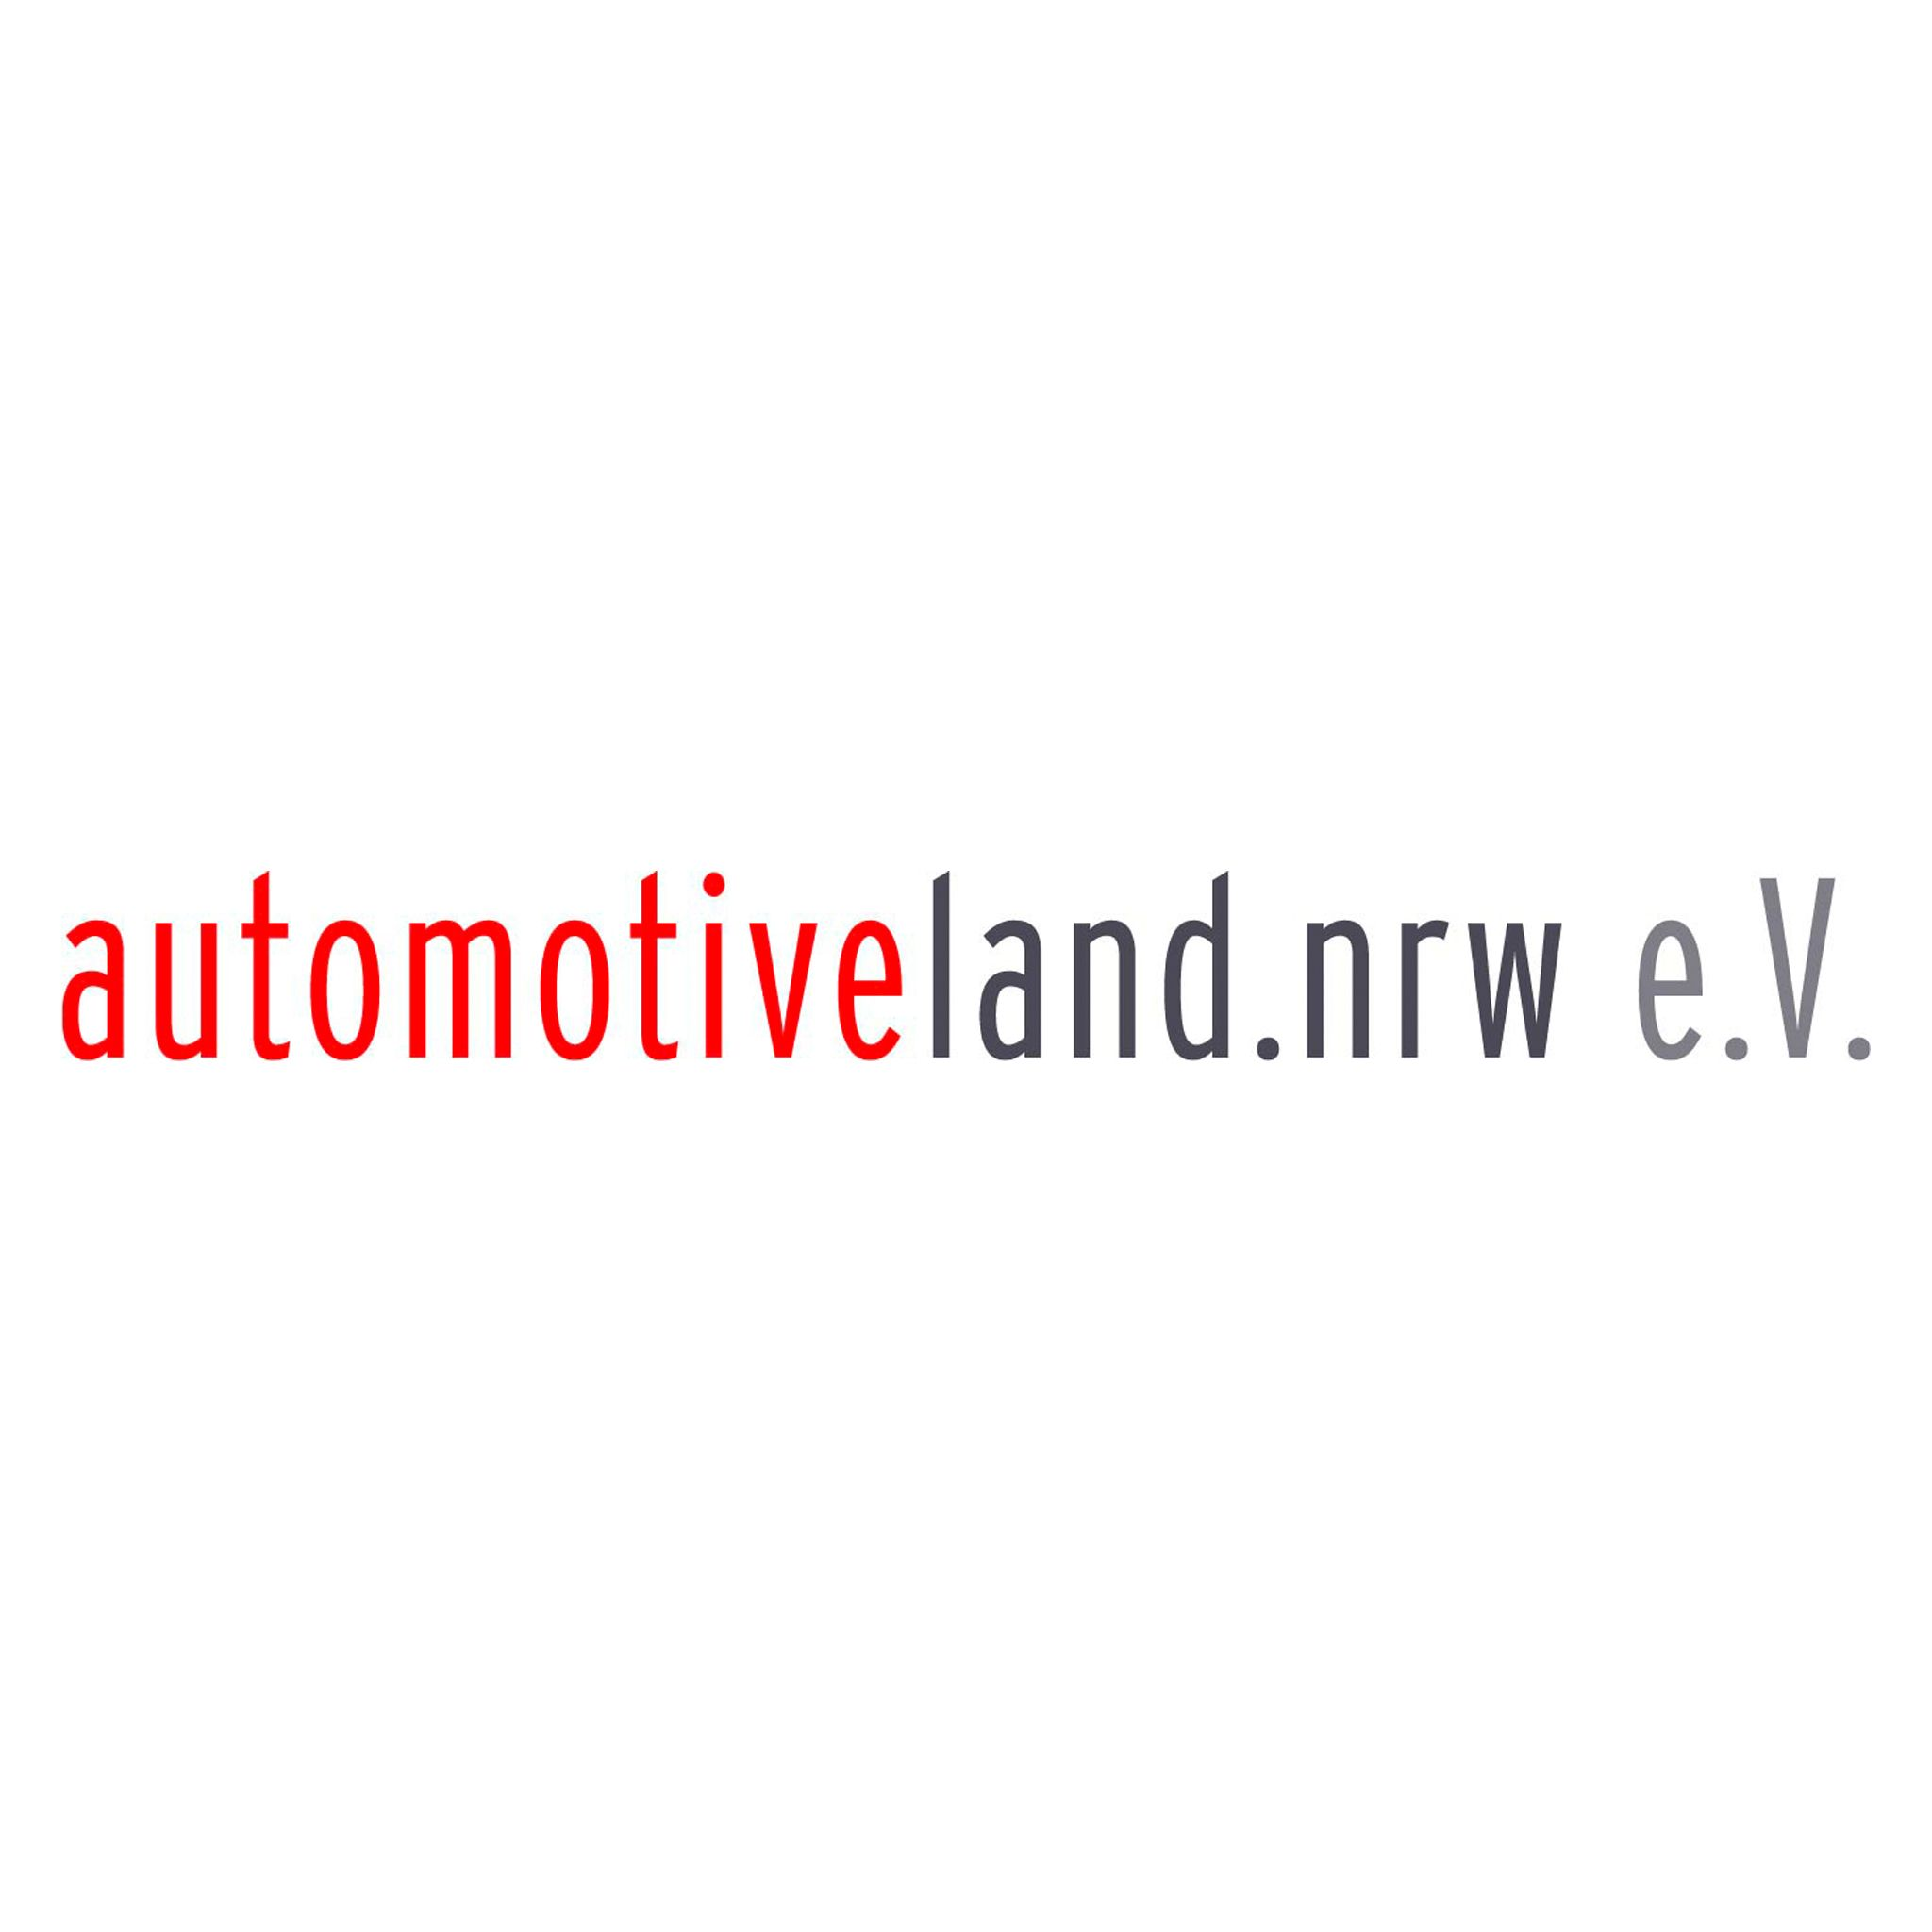 automotiveland.NRW